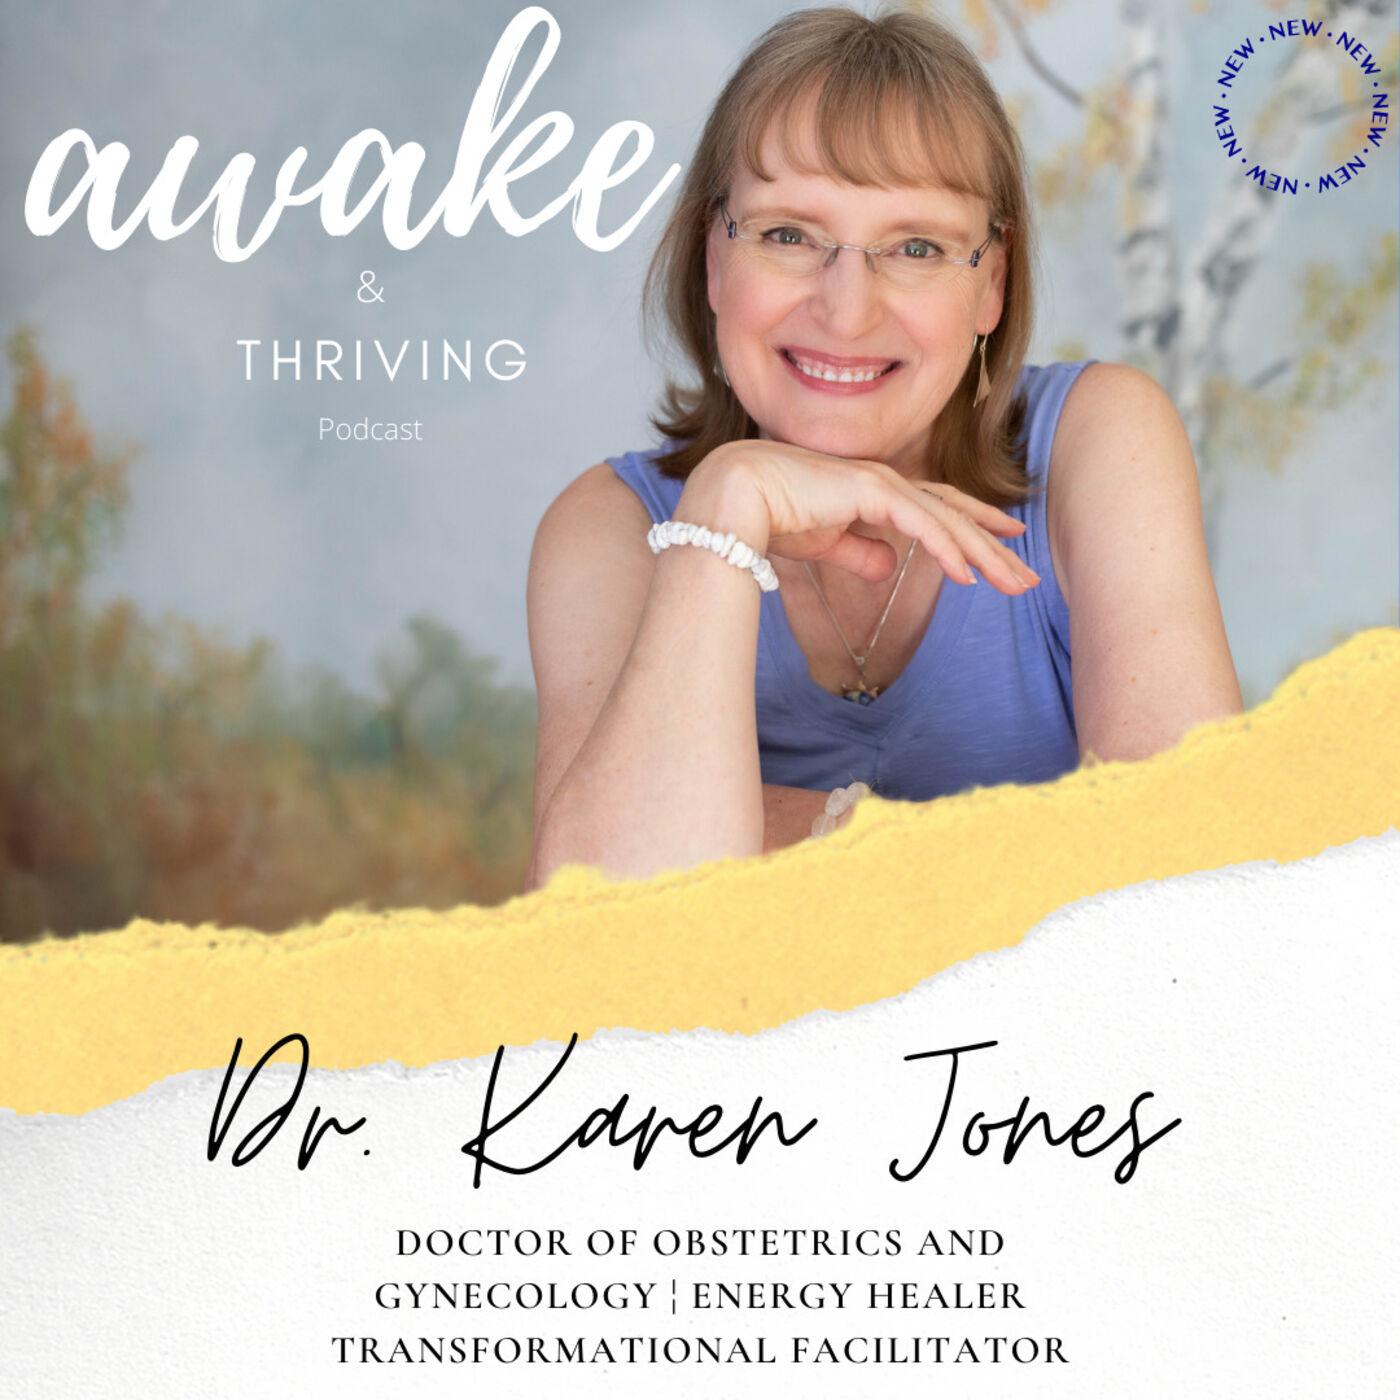 Understanding Energy Healing and Transformational Facilitating with Dr. Karen Jones